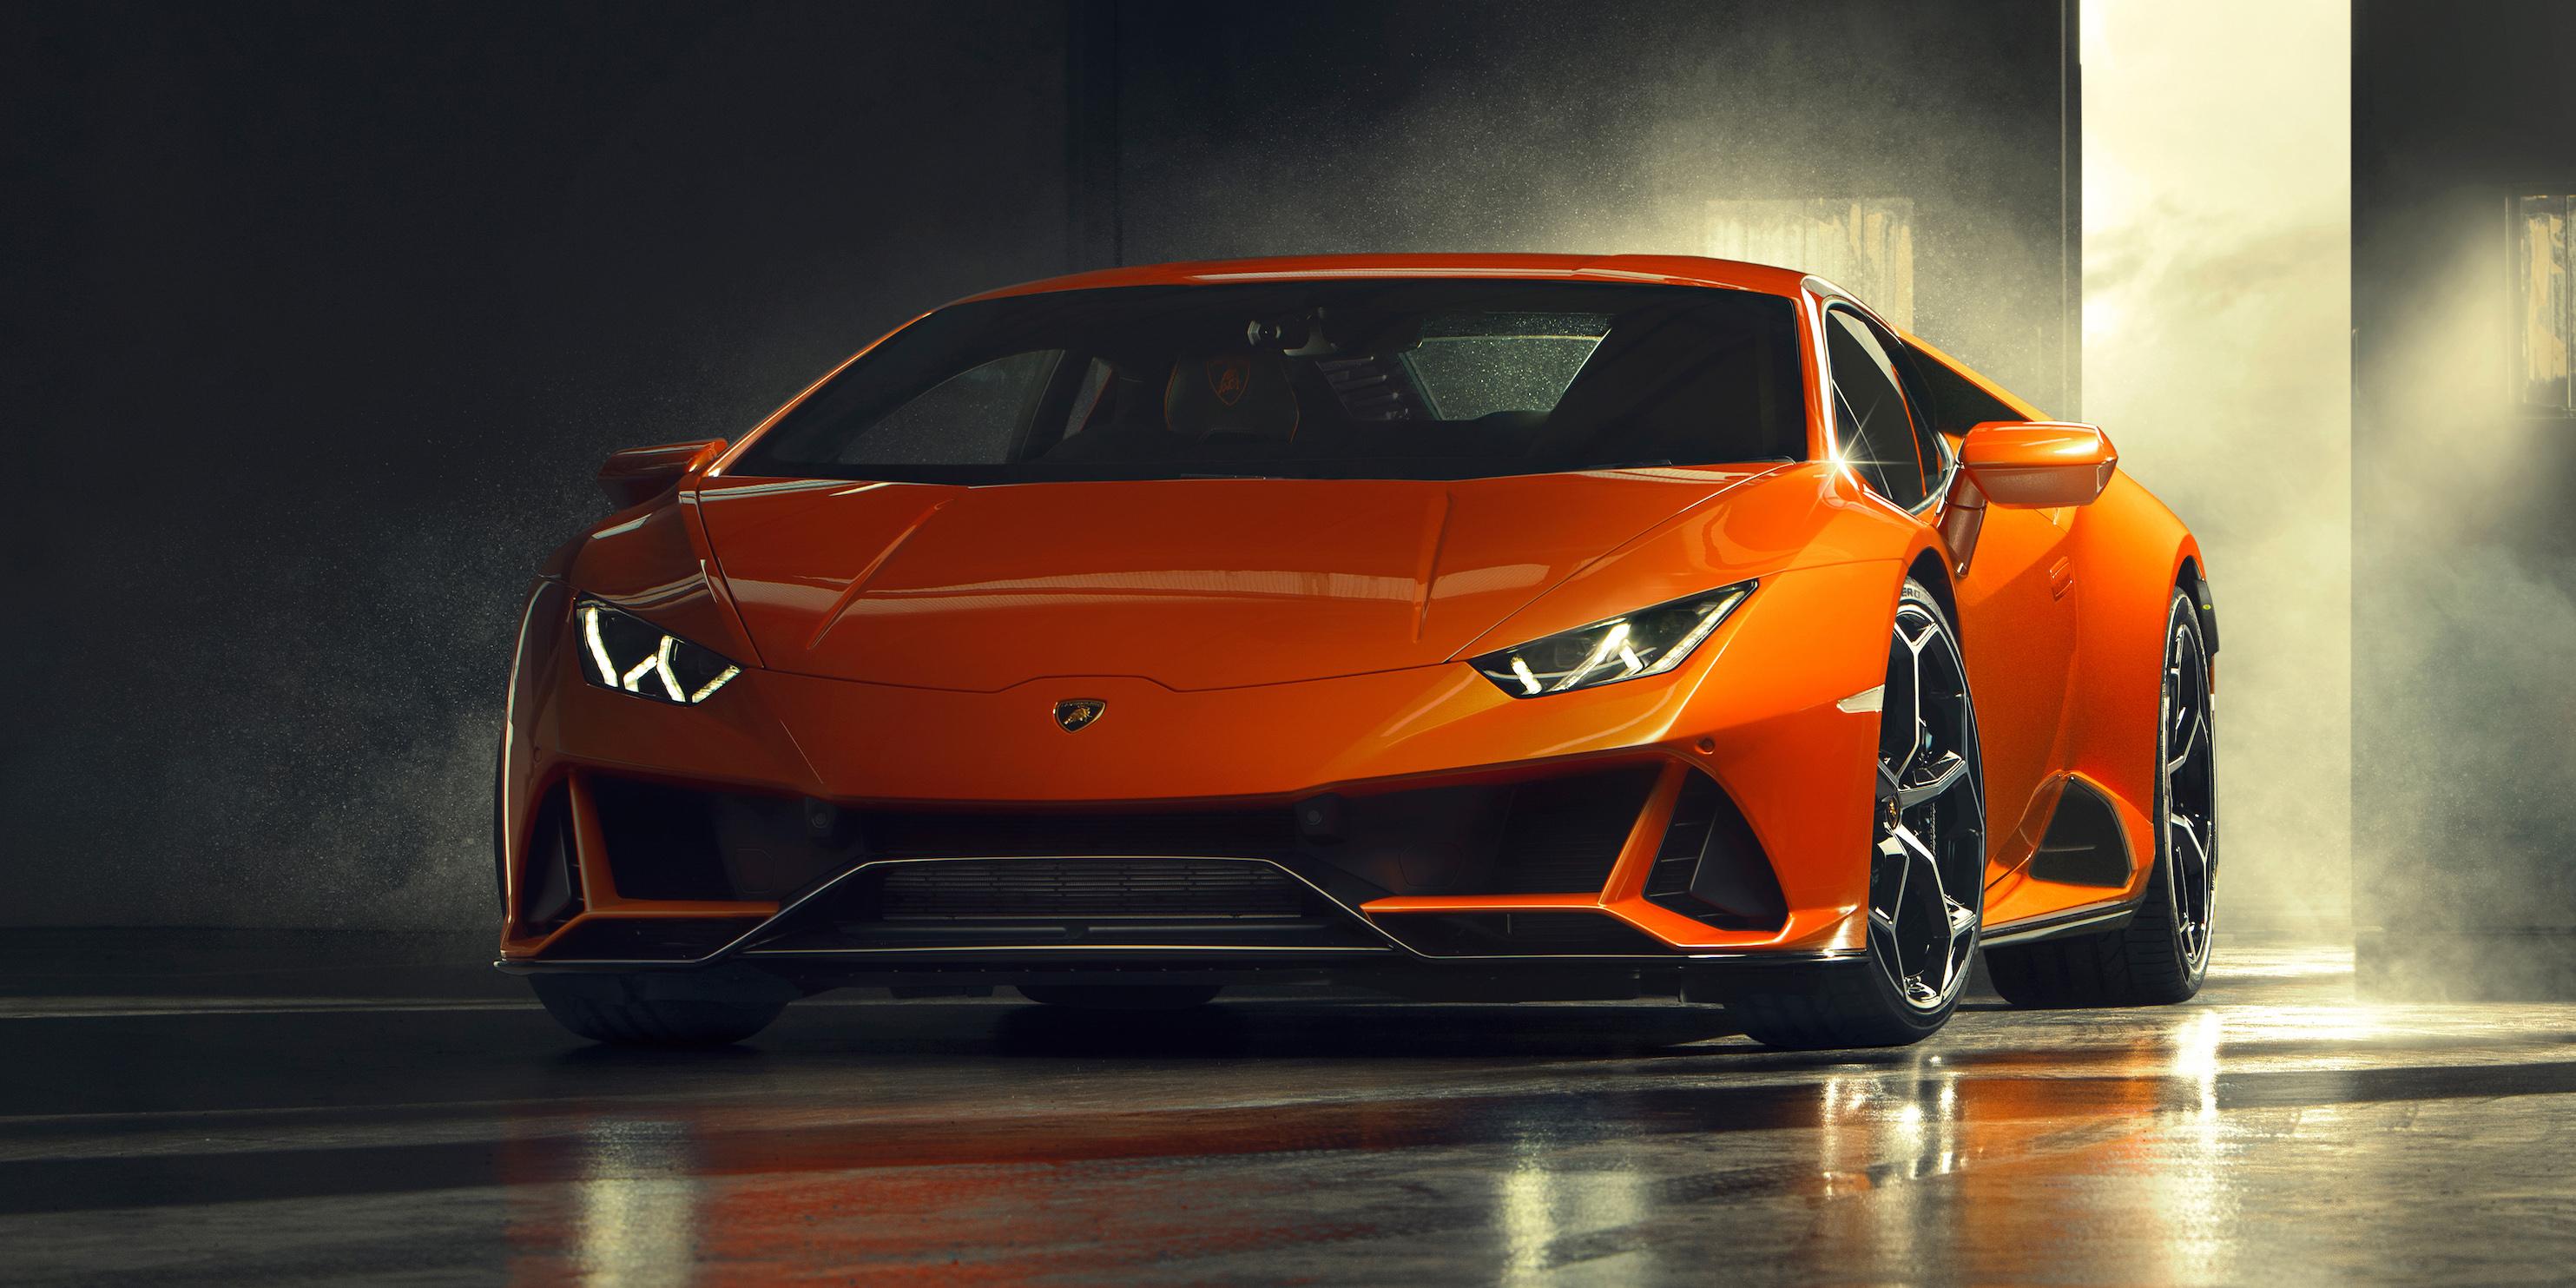 The New Lamborghini Huracan Evo Is A Kinder Performante Torque